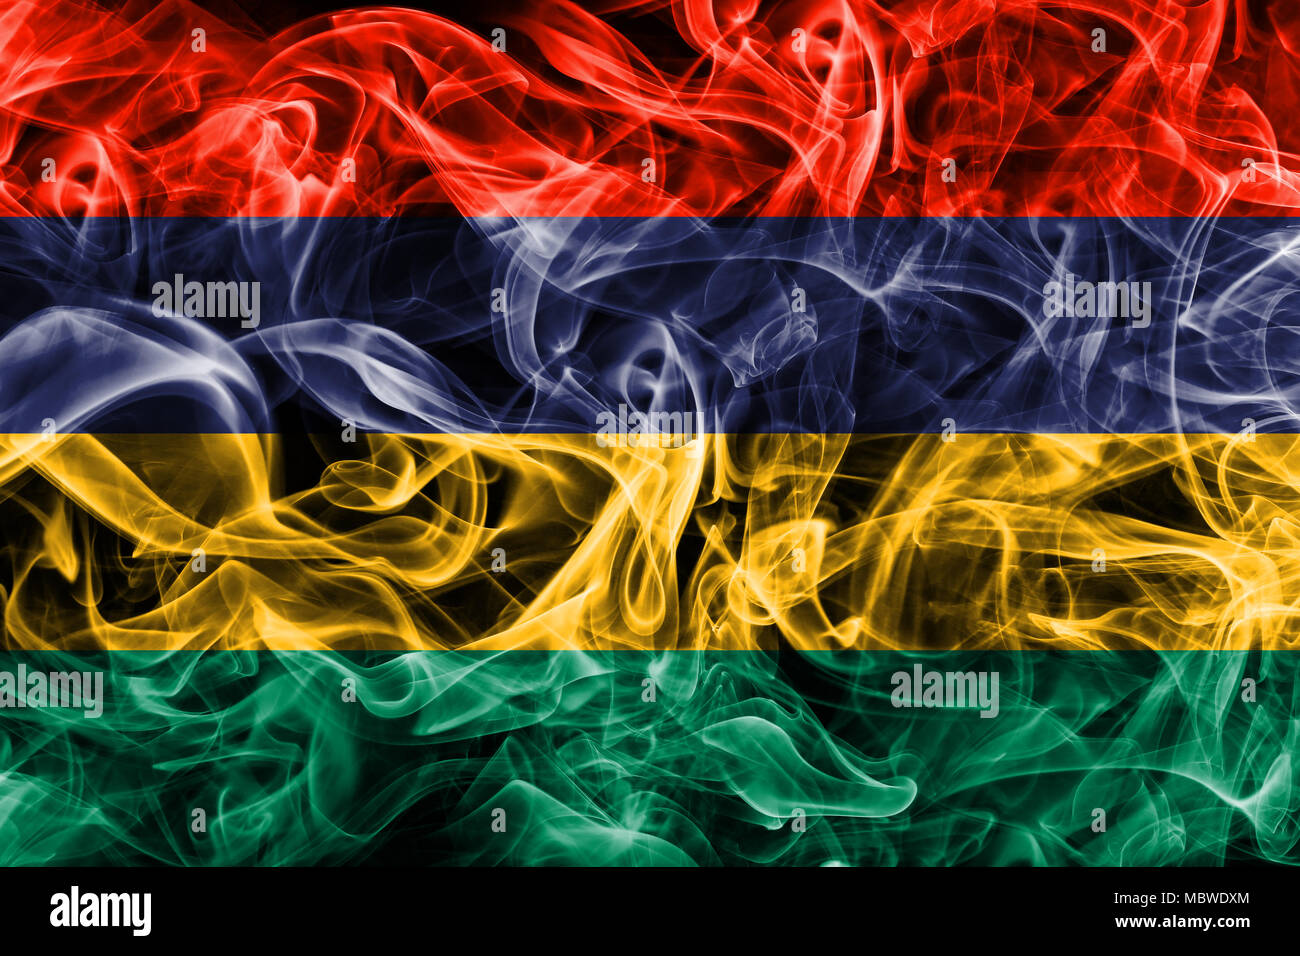 Mauritius smoke flag - Stock Image